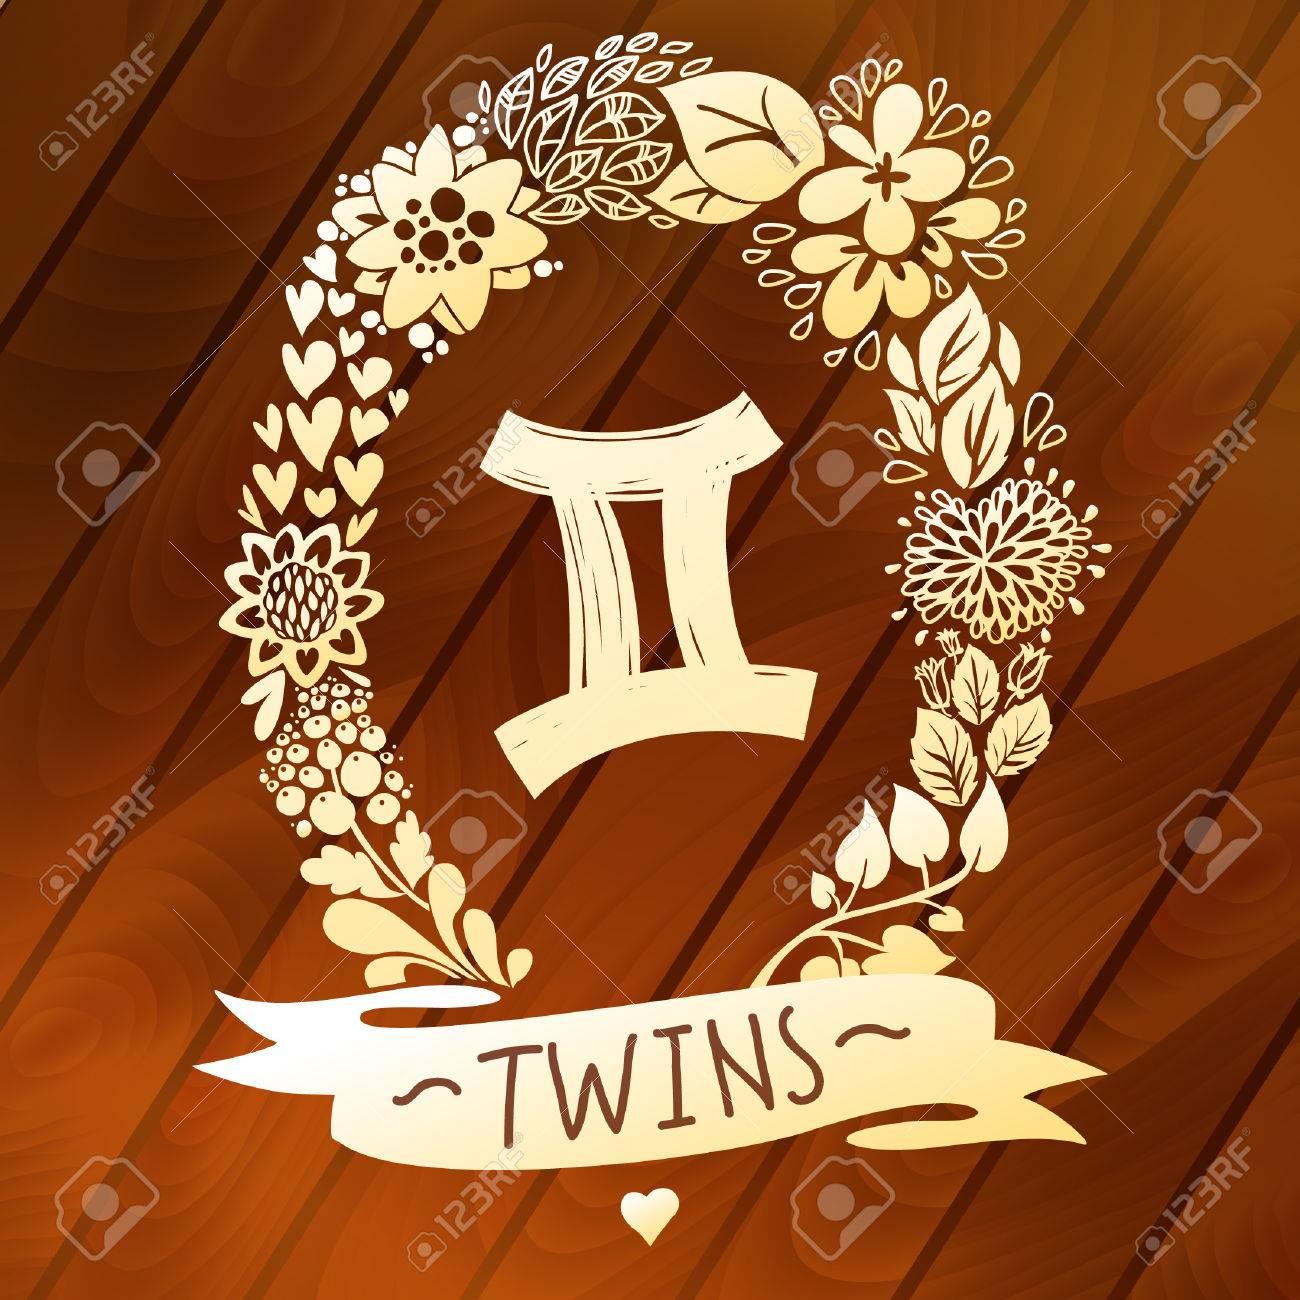 Zodiac sign gemini twins in a sweet gold floral wreath on zodiac sign gemini twins in a sweet gold floral wreath on vector wood planks horoscope buycottarizona